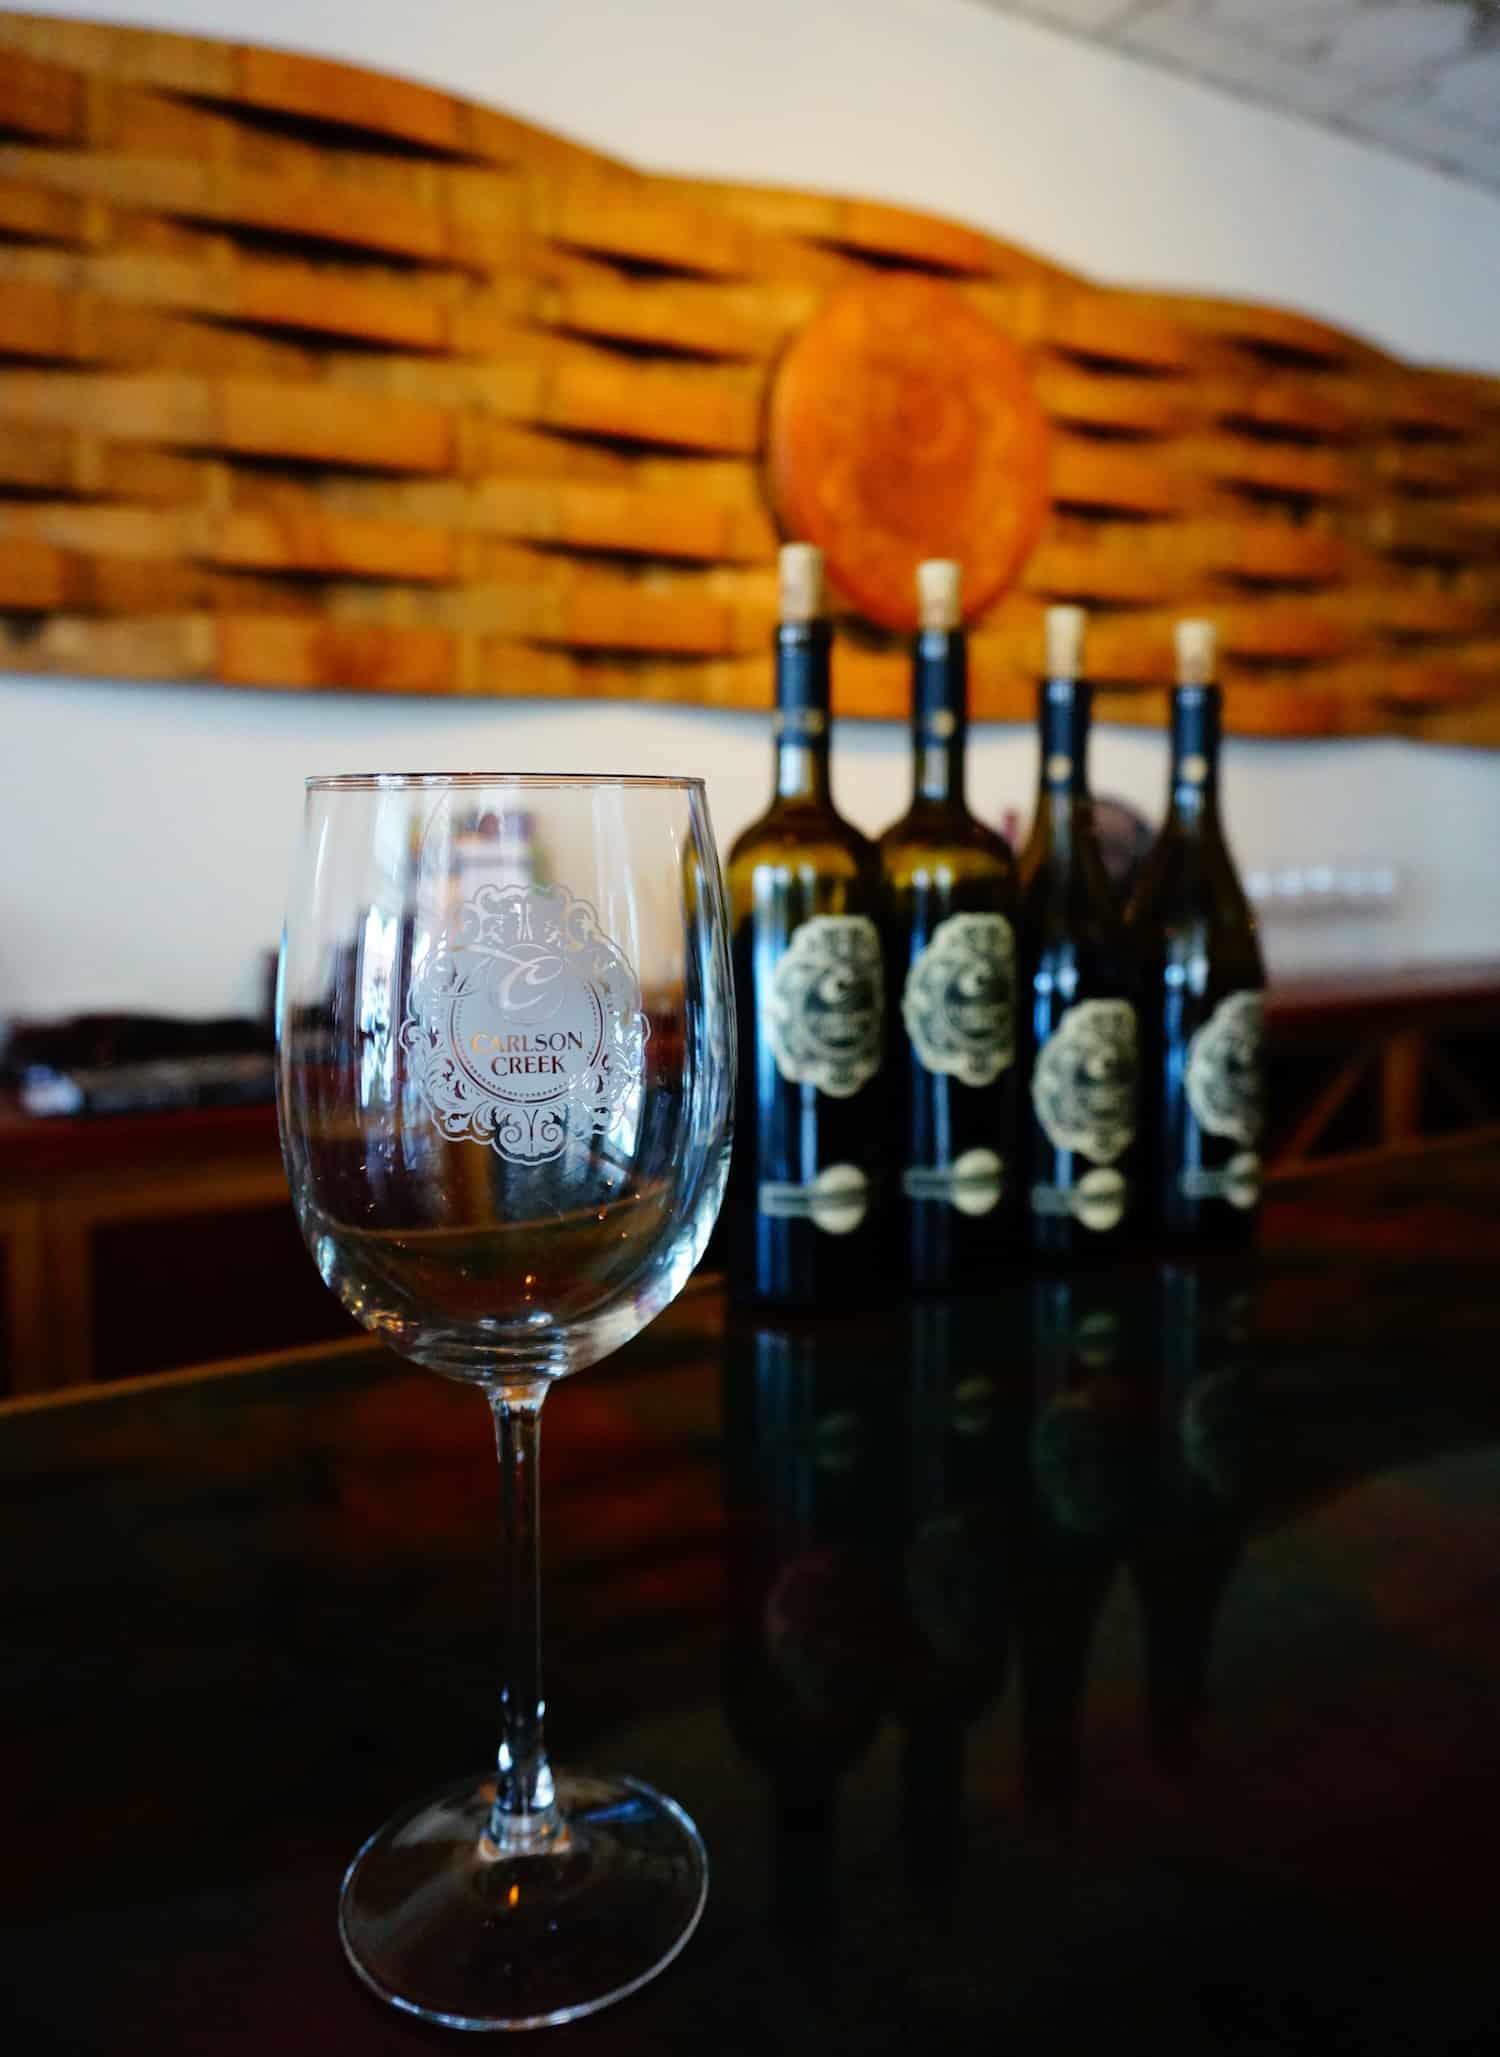 Scottsdale Drinks - Arizona Wine - Carlson Creek Winery